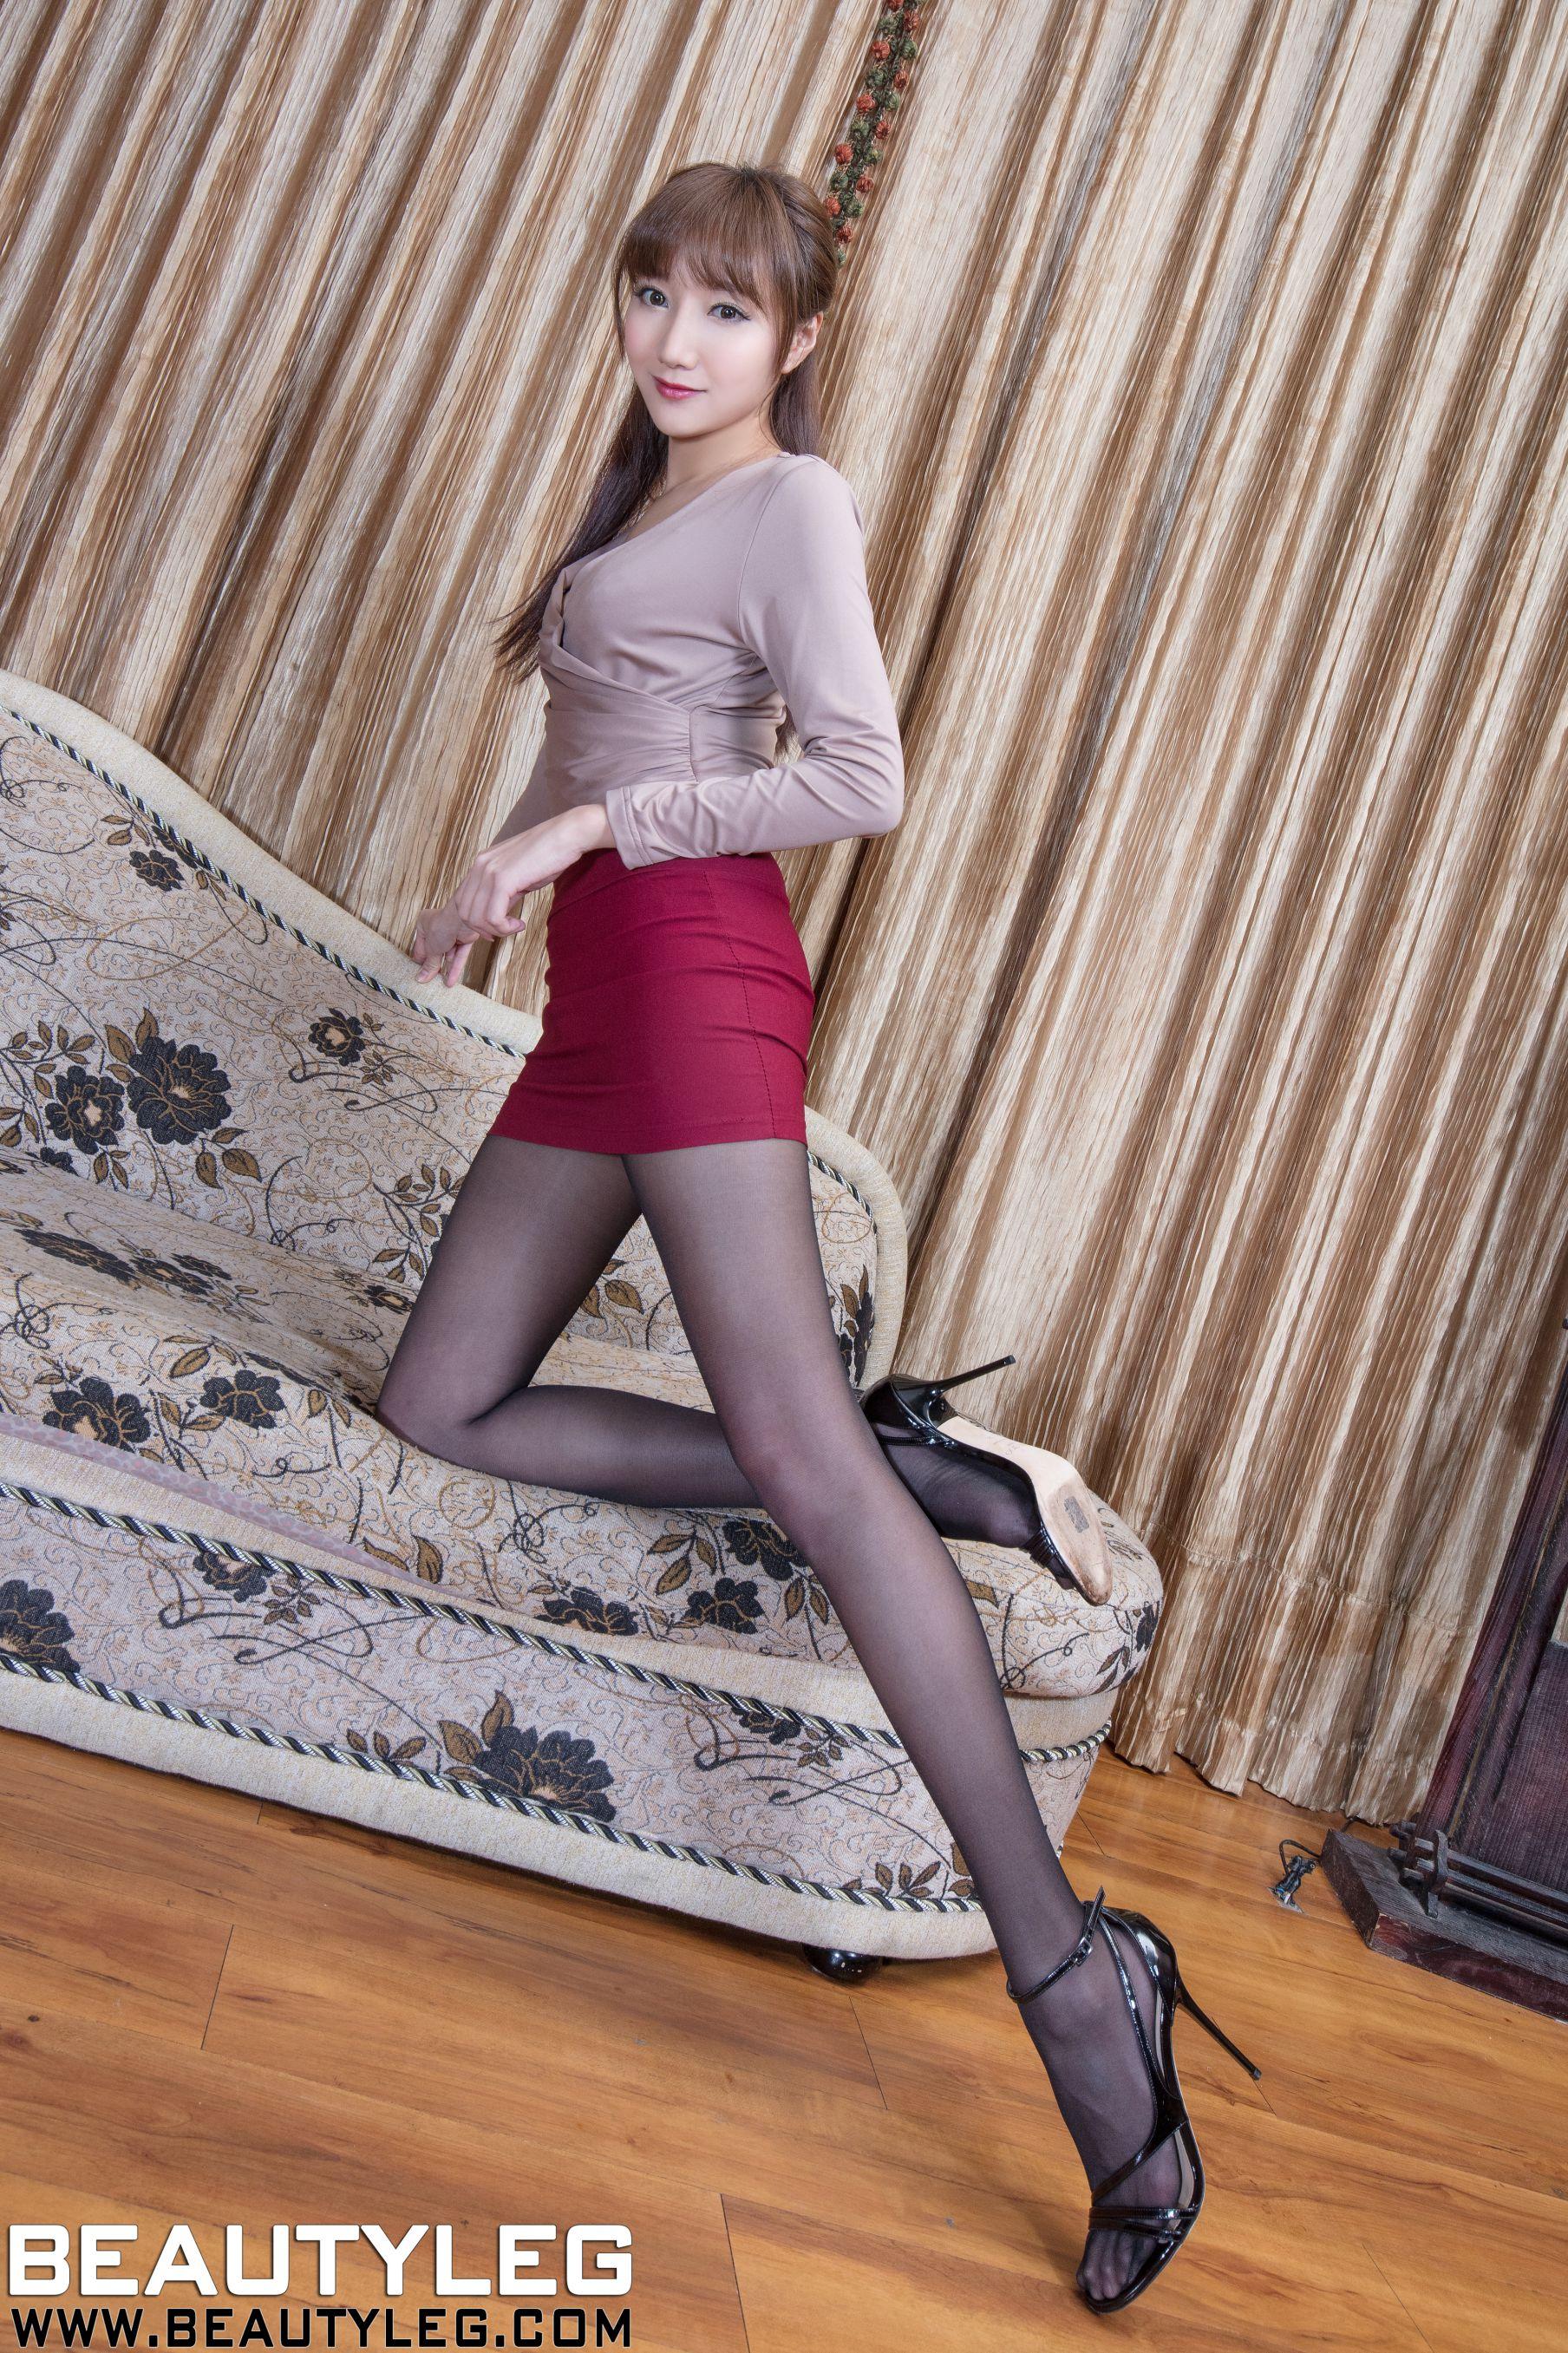 VOL.100 [Beautyleg]丝袜美女美腿:陈思婷(腿模Tina,李霜)高品质写真套图(48P)